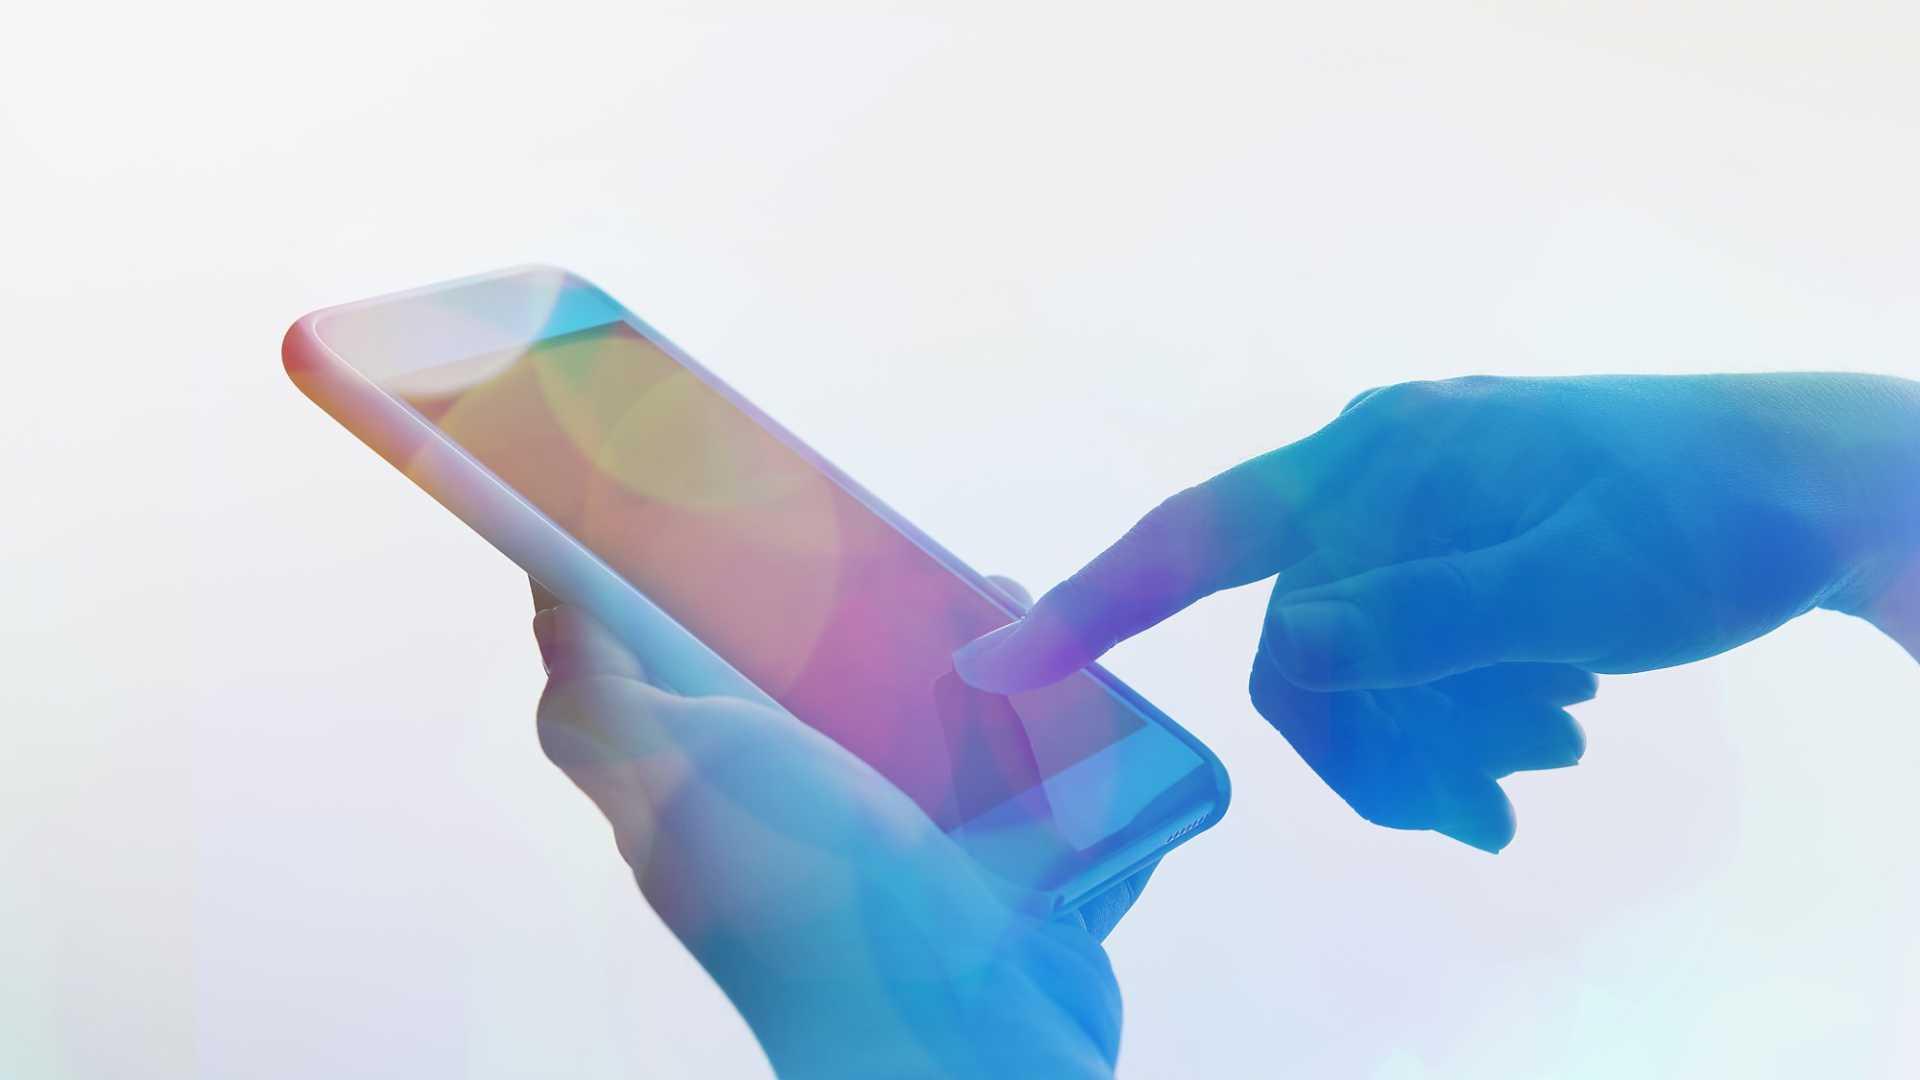 3 Predictions for the Future of E-Commerce in 2020